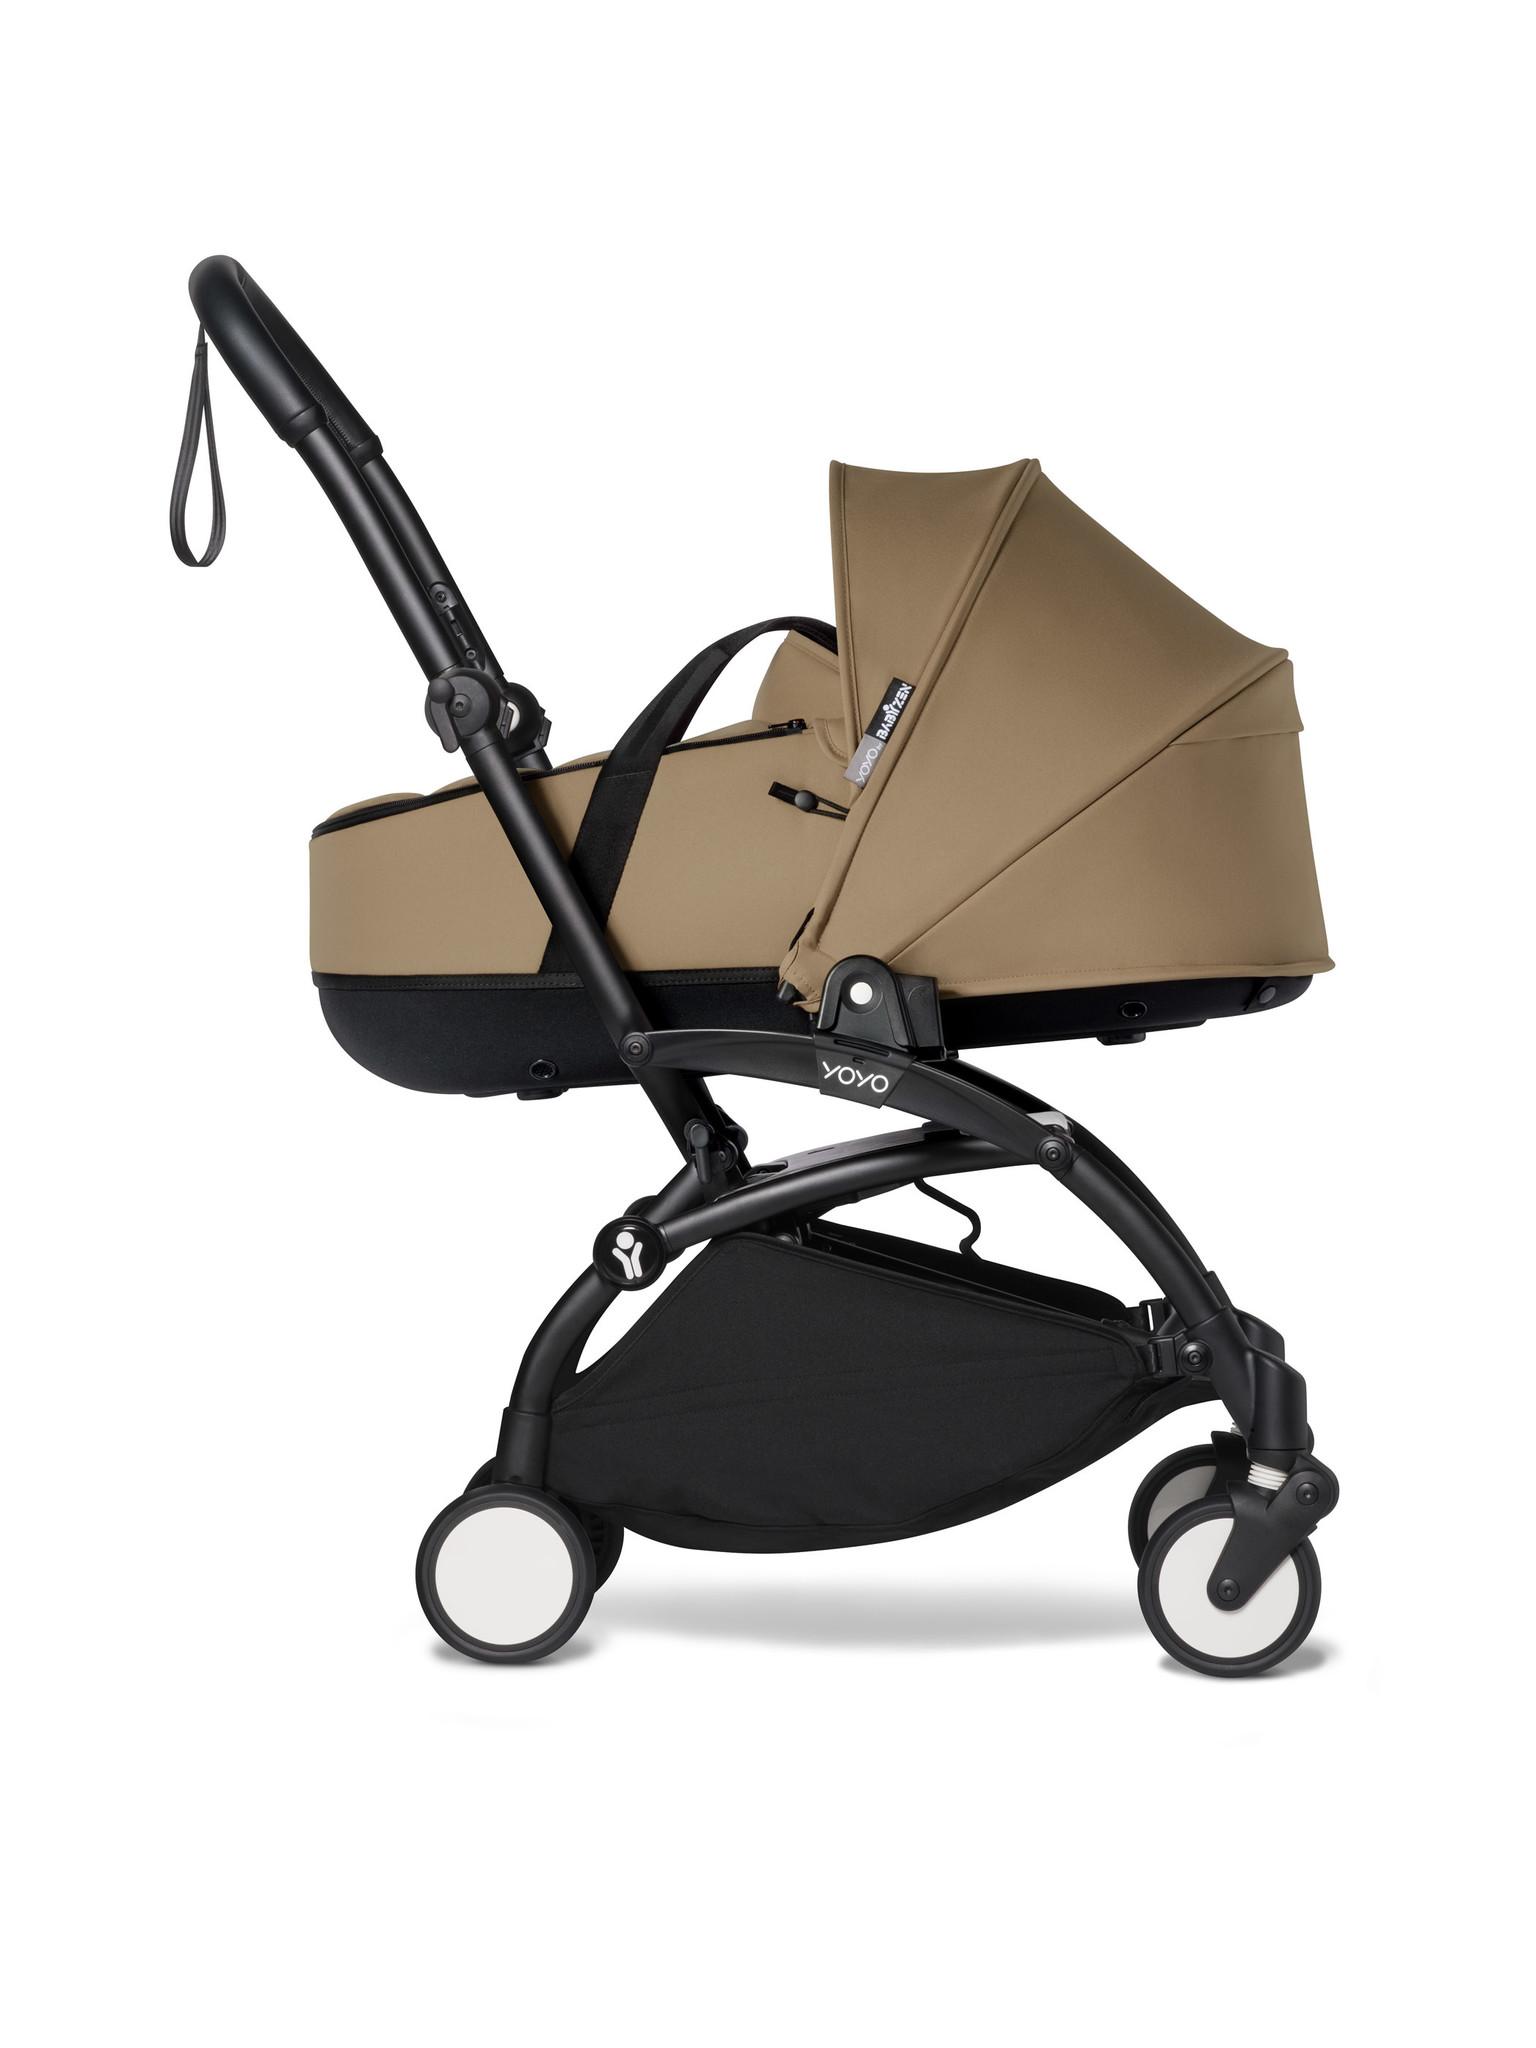 Babyzen Babyzen YOYO² schwarzer Rahmen mit YOYO Stubenwagen - Tragetasche - Toffee